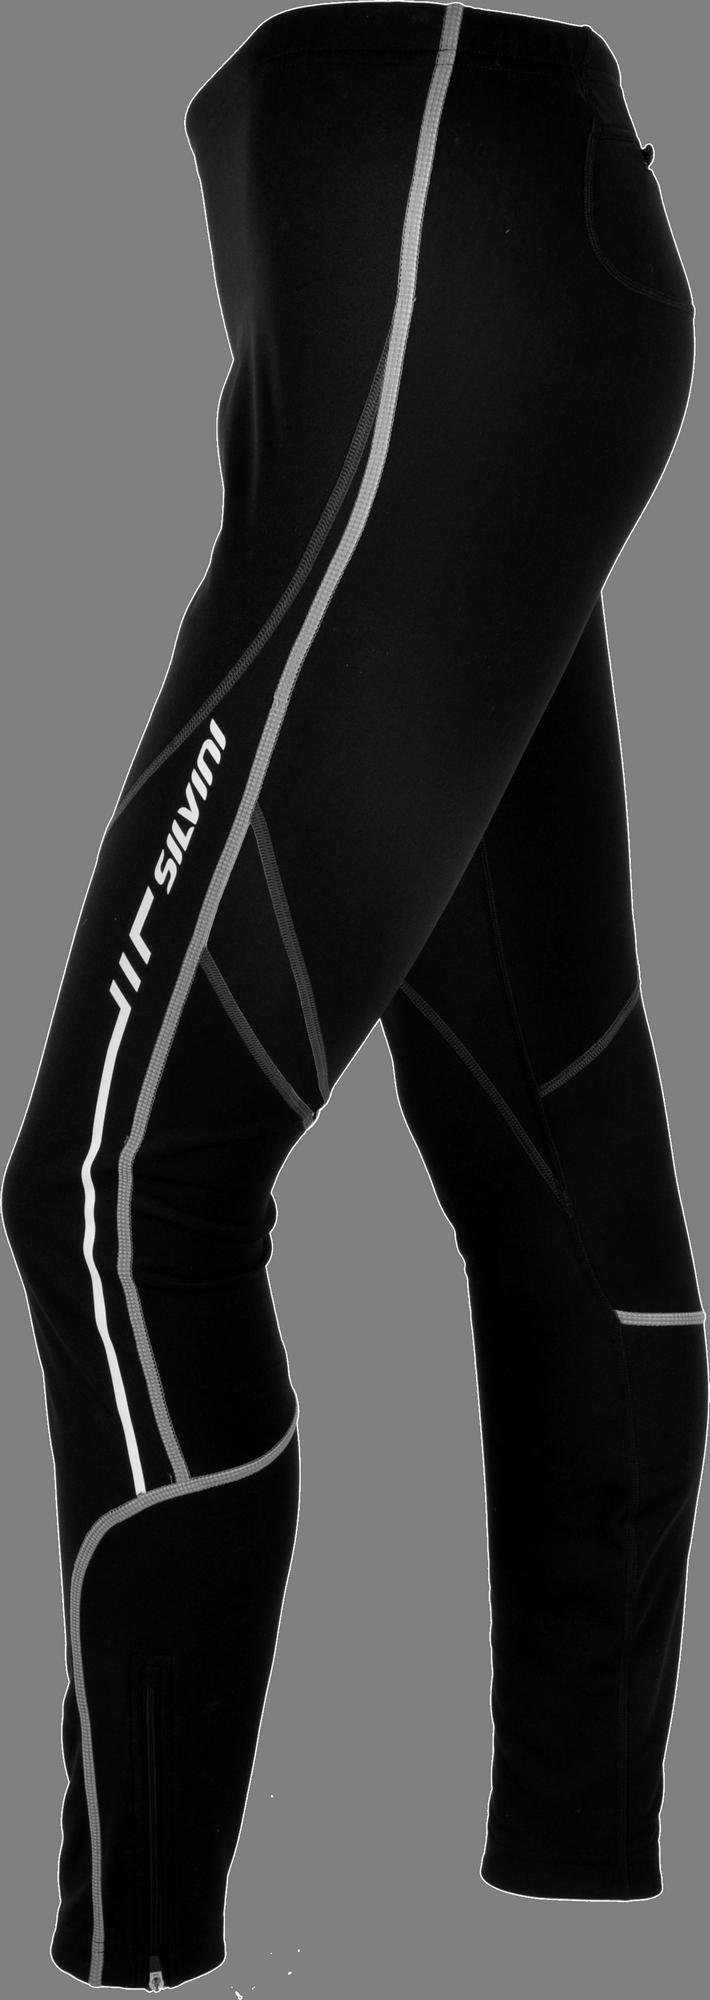 60d267501251d Dámske cyklistické nohavice dlhé Silvini Movenza WP55P s cyklovložkou